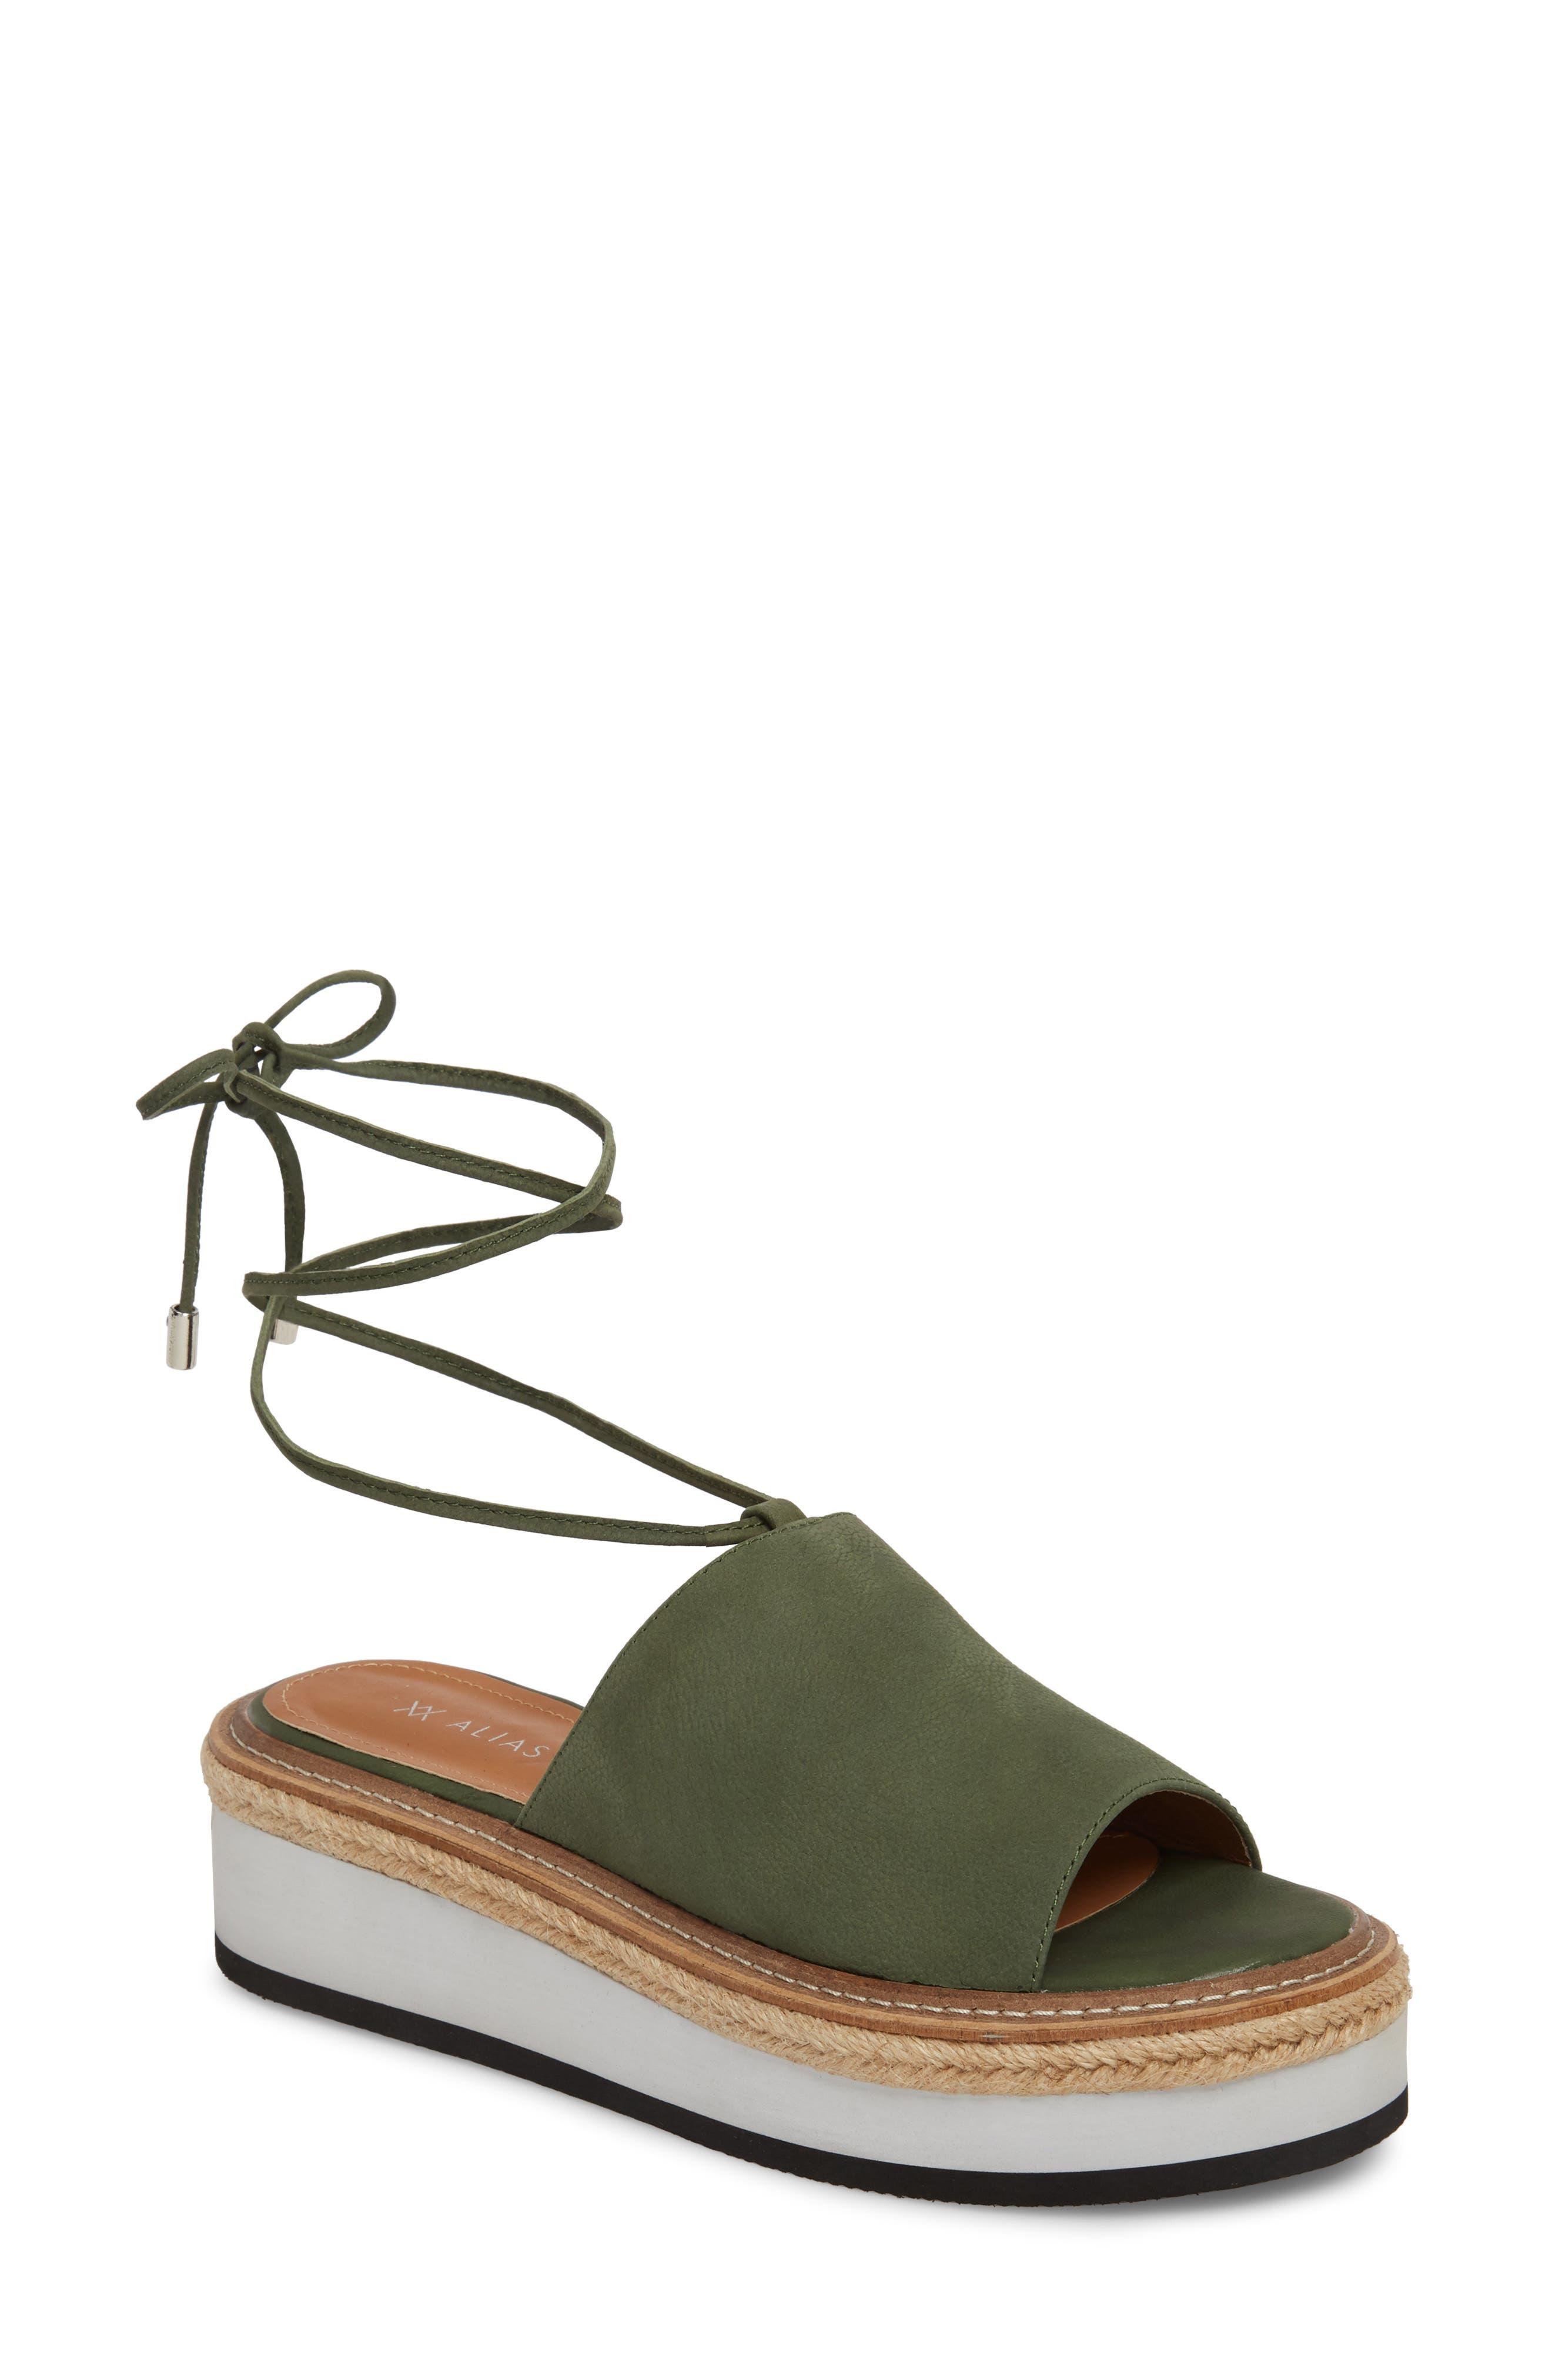 Nickel Platform Sandal,                         Main,                         color, Khaki Nubuck Leather